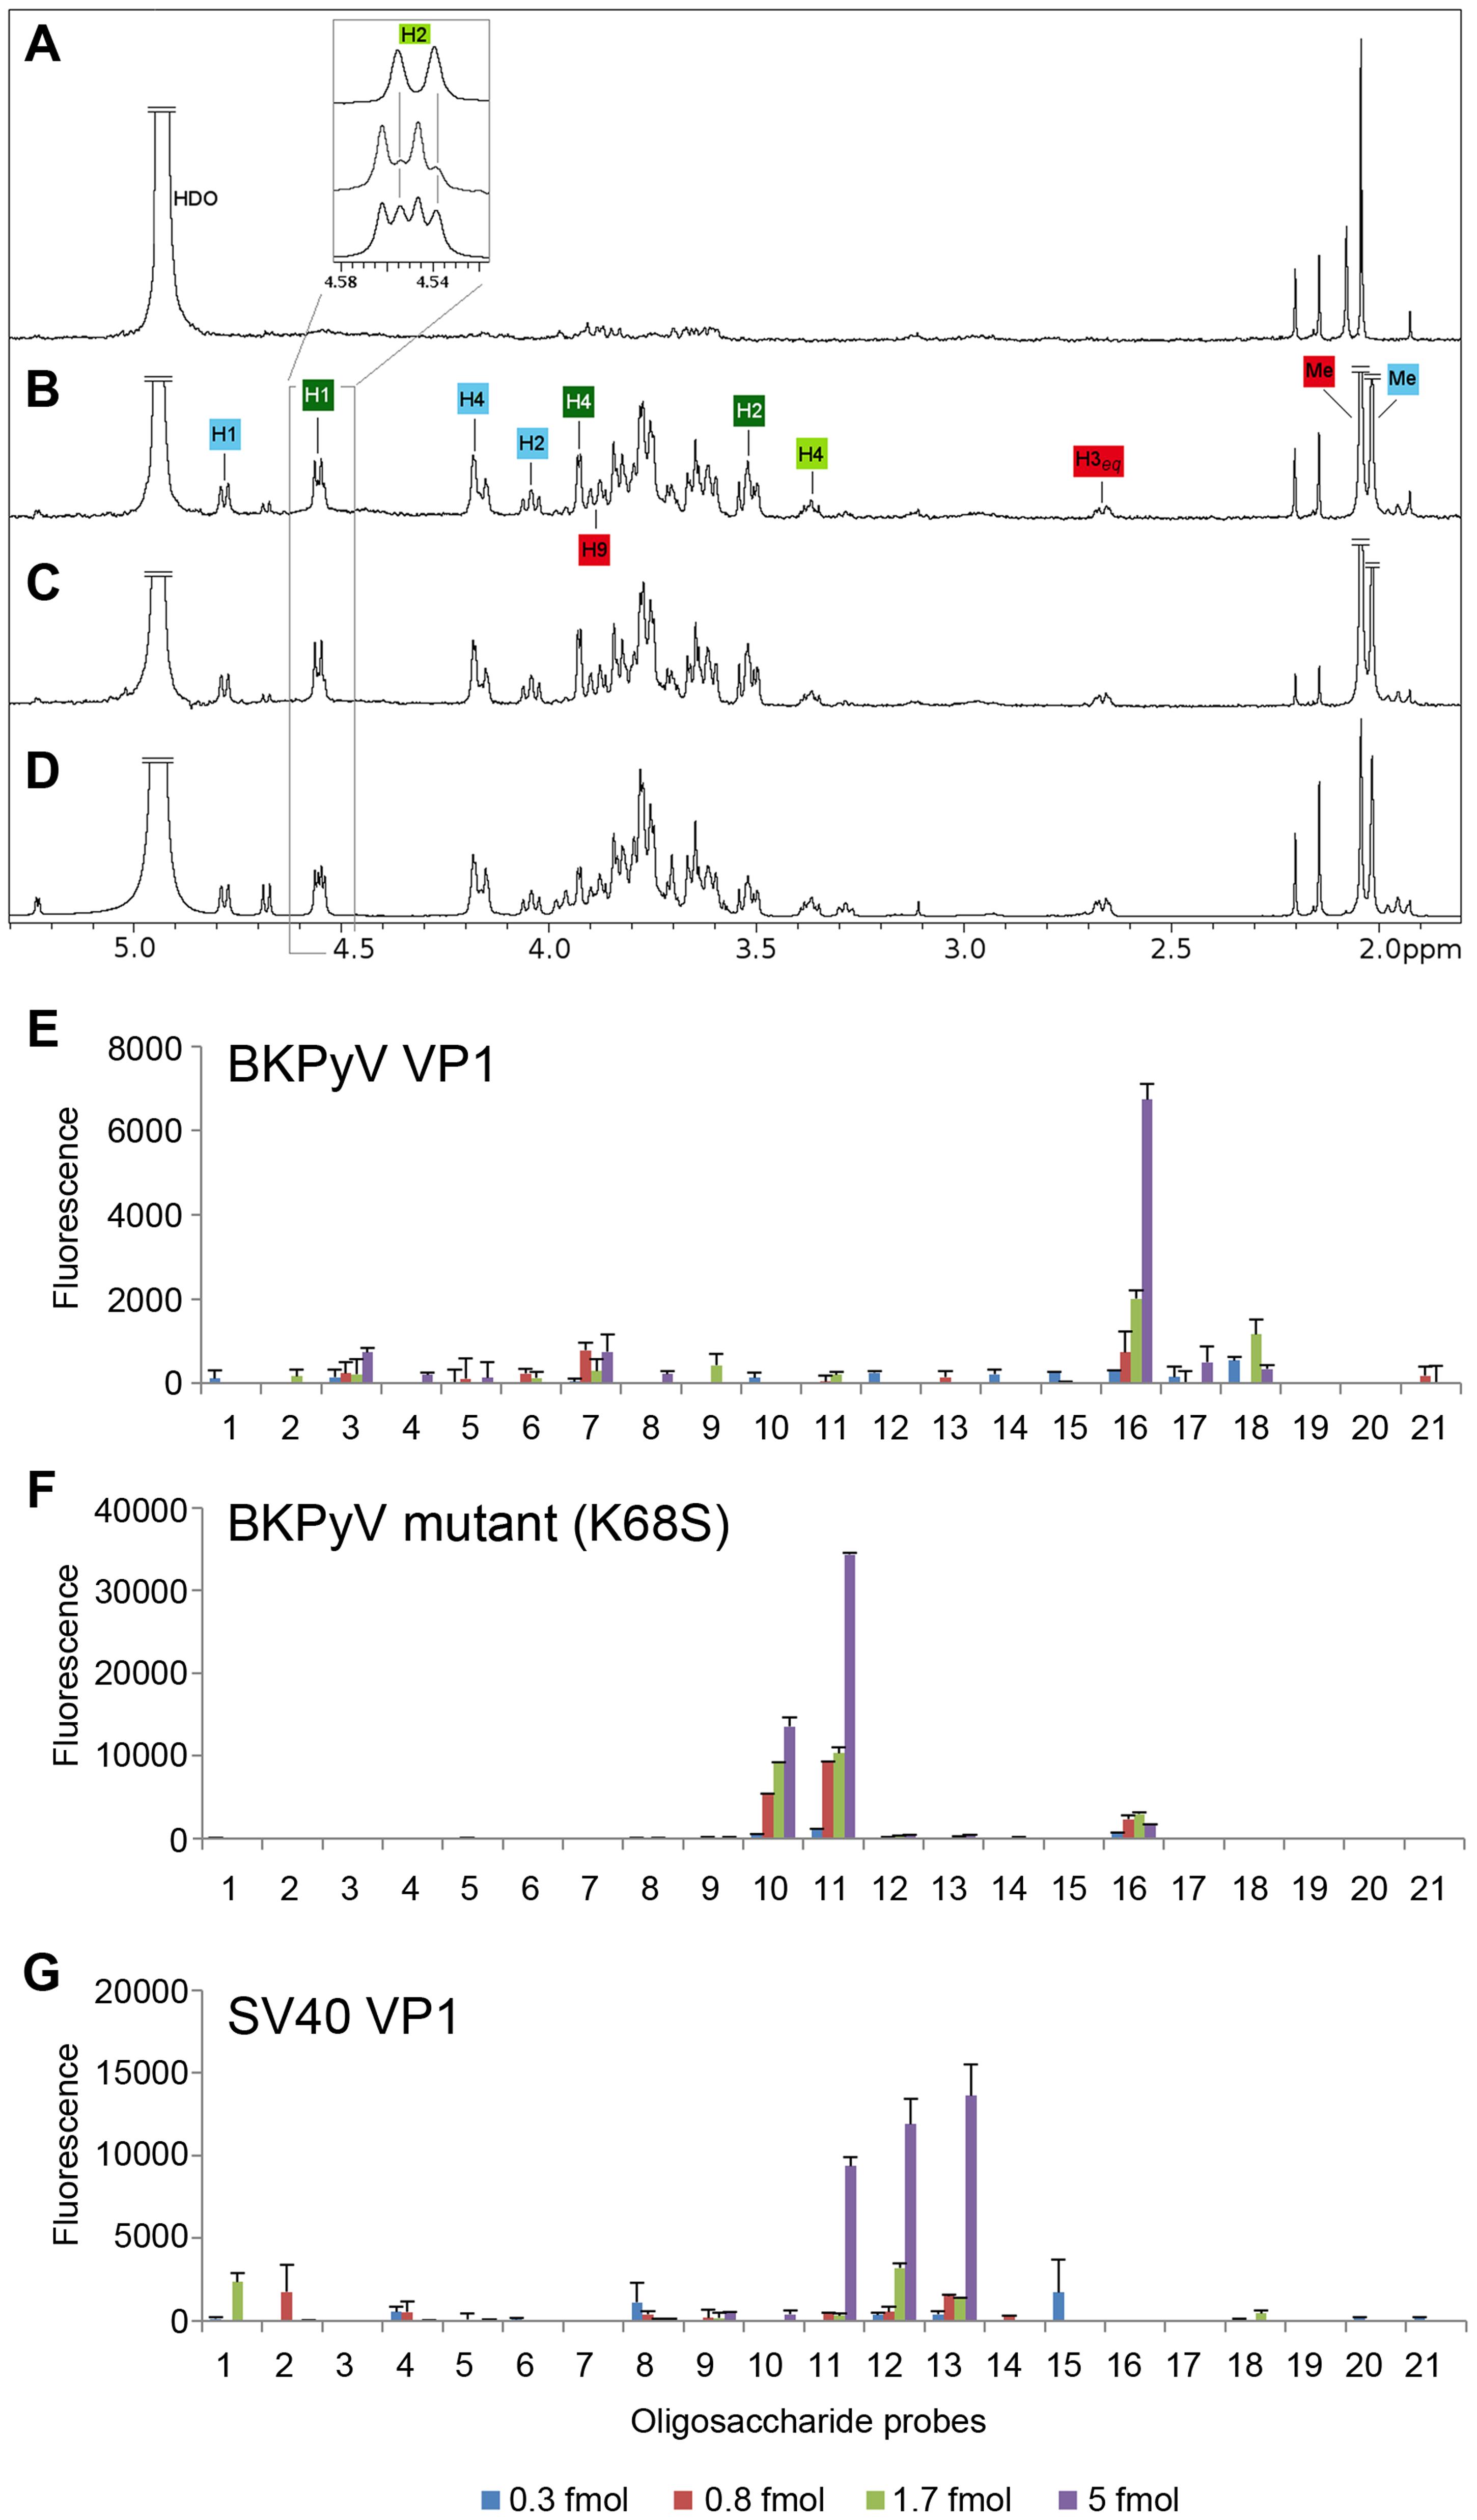 The K68S mutation targets BKPyV to the SV40 receptor GM1.